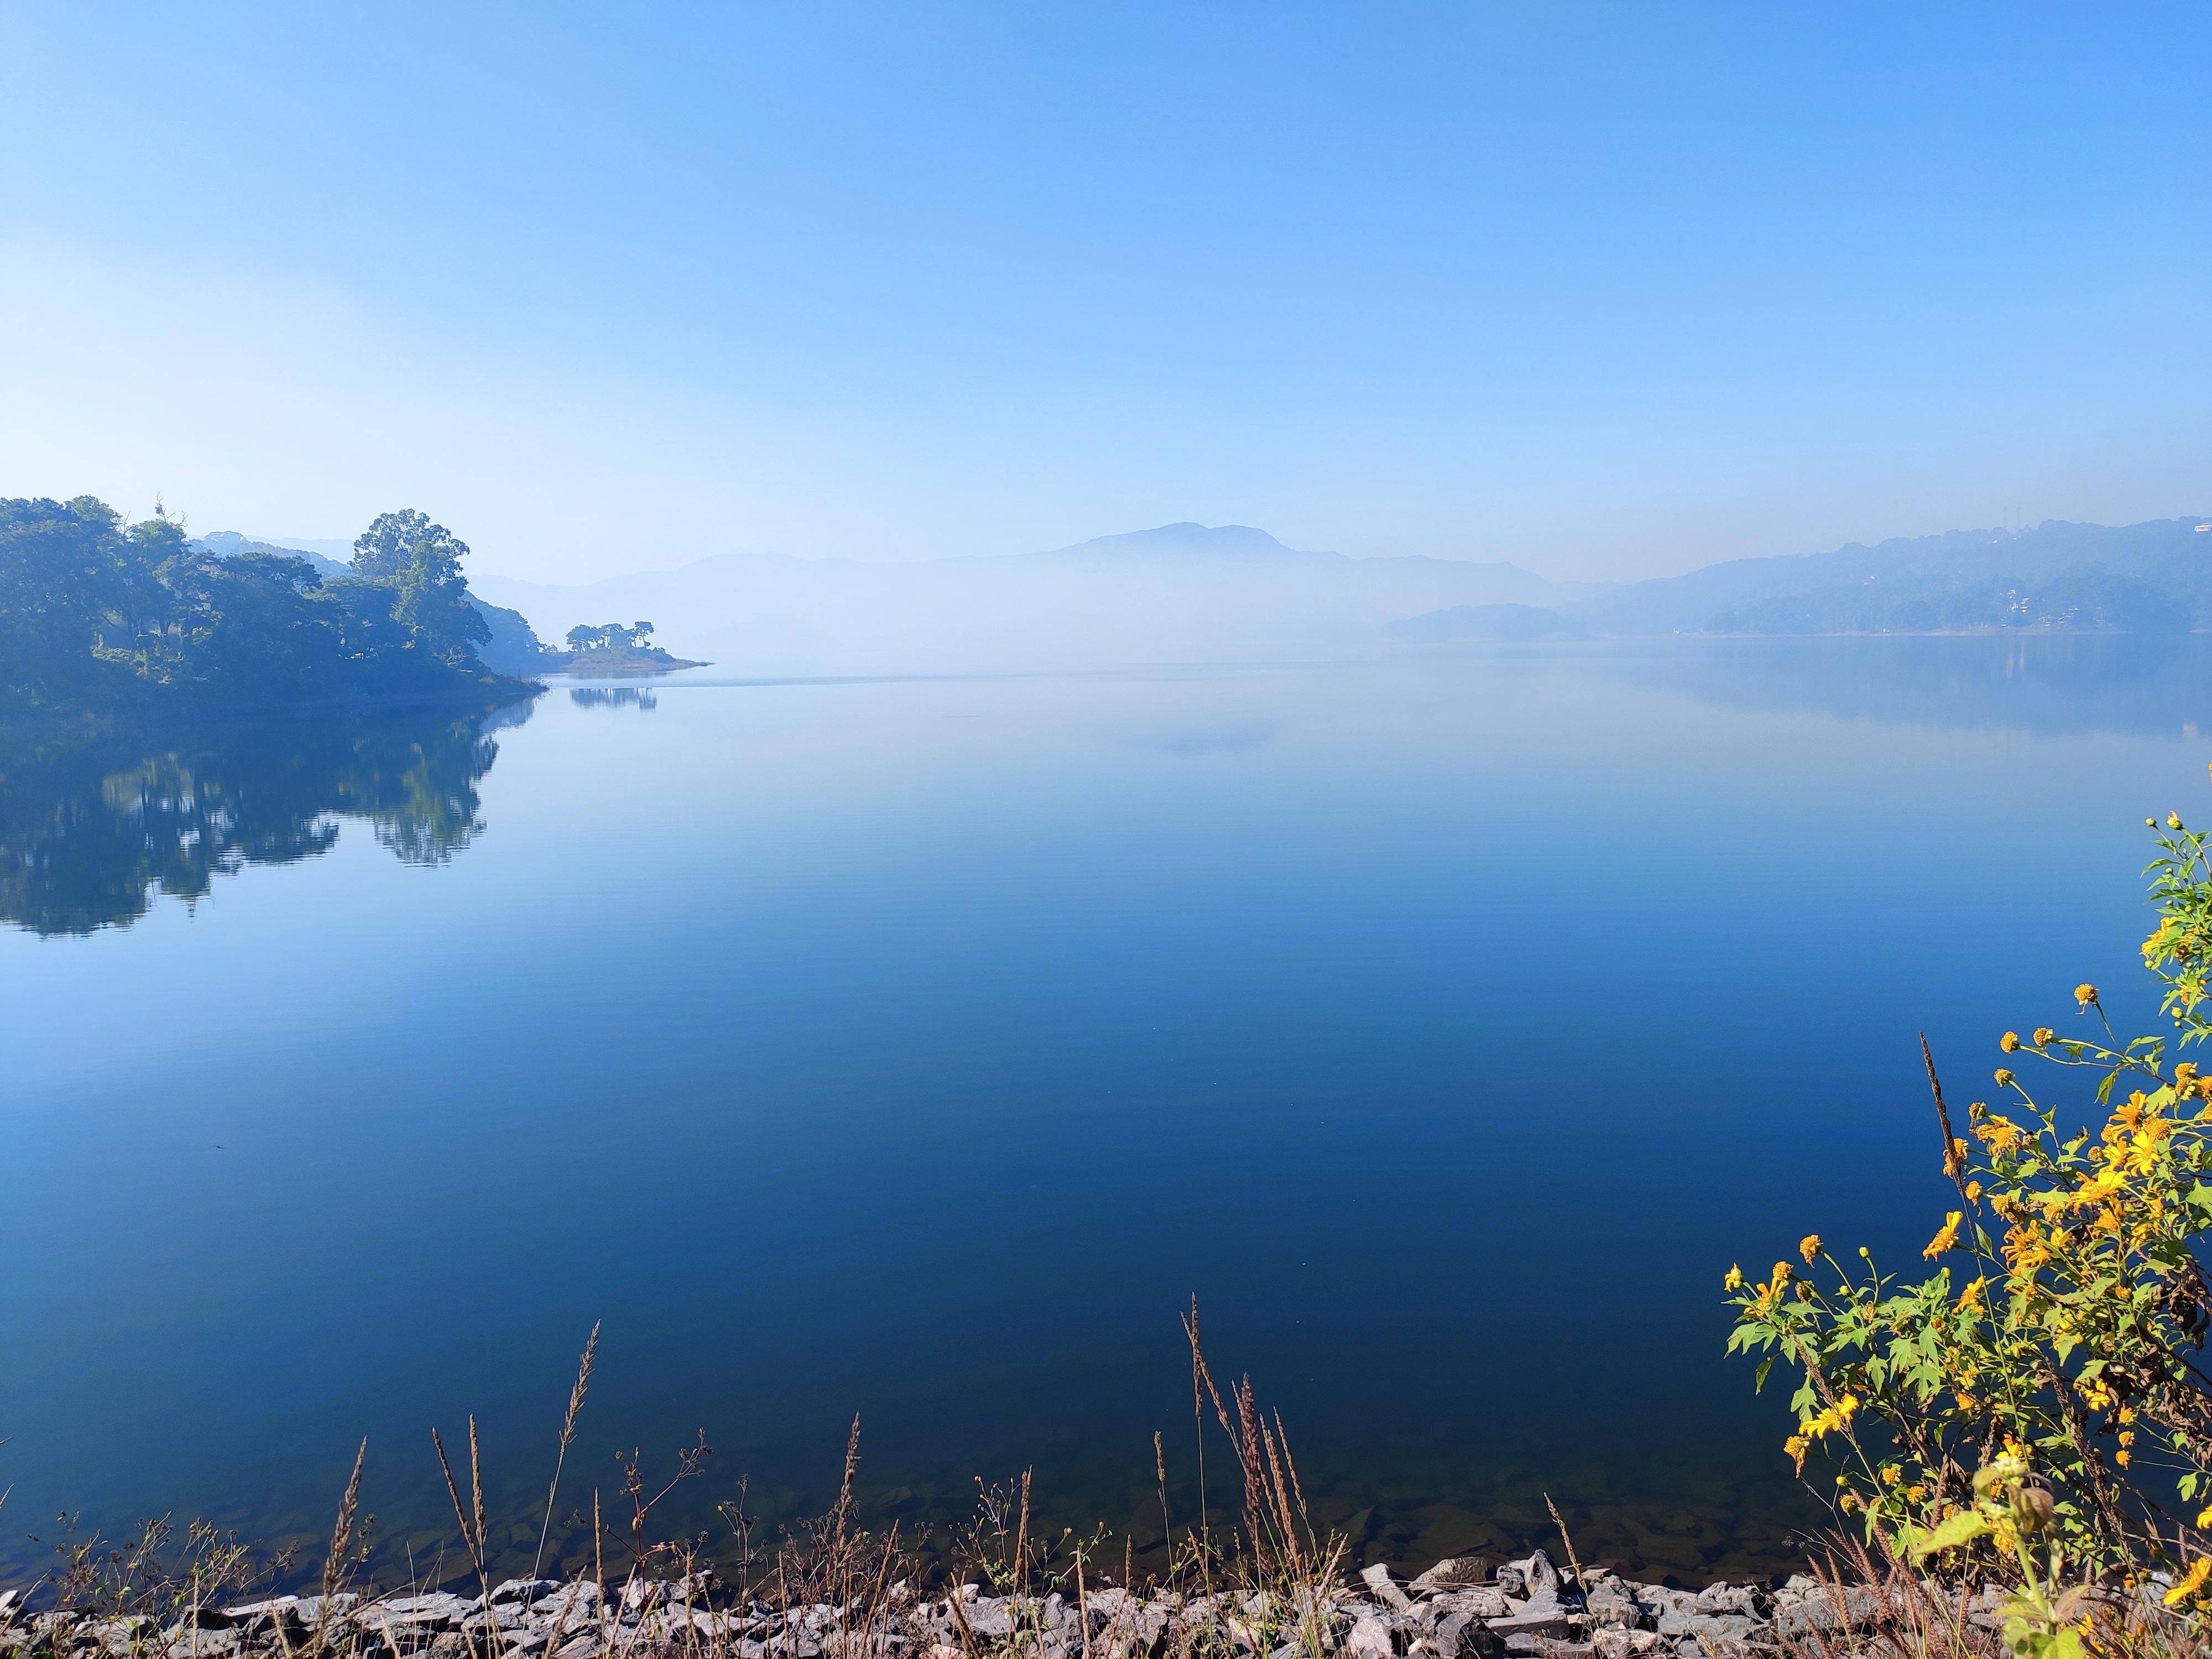 View of Umiam Lake